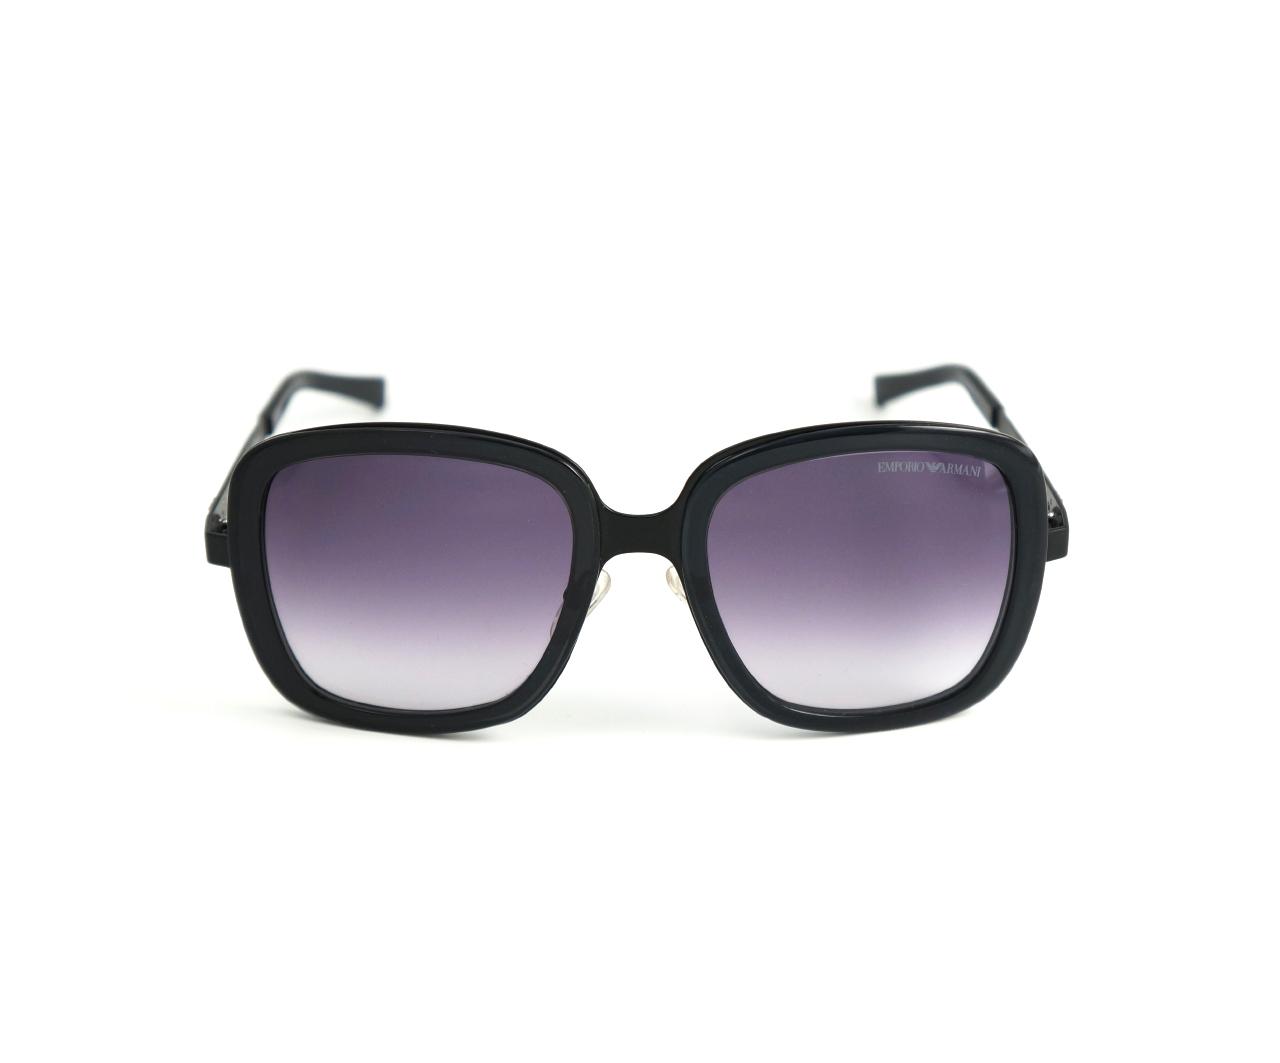 emporio-armani-ea-9852s-bwt9c-occhiale-vintage-1